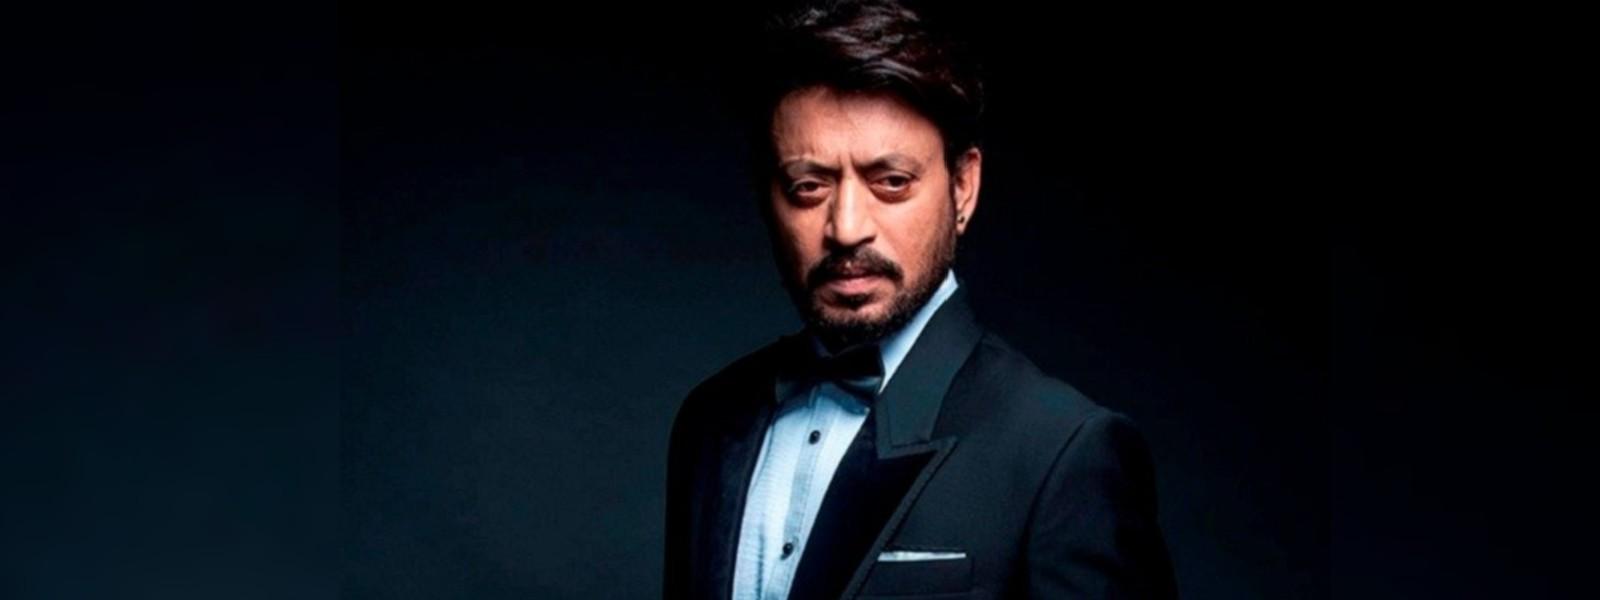 Bollywood actor Irrfan Khan dead at 53